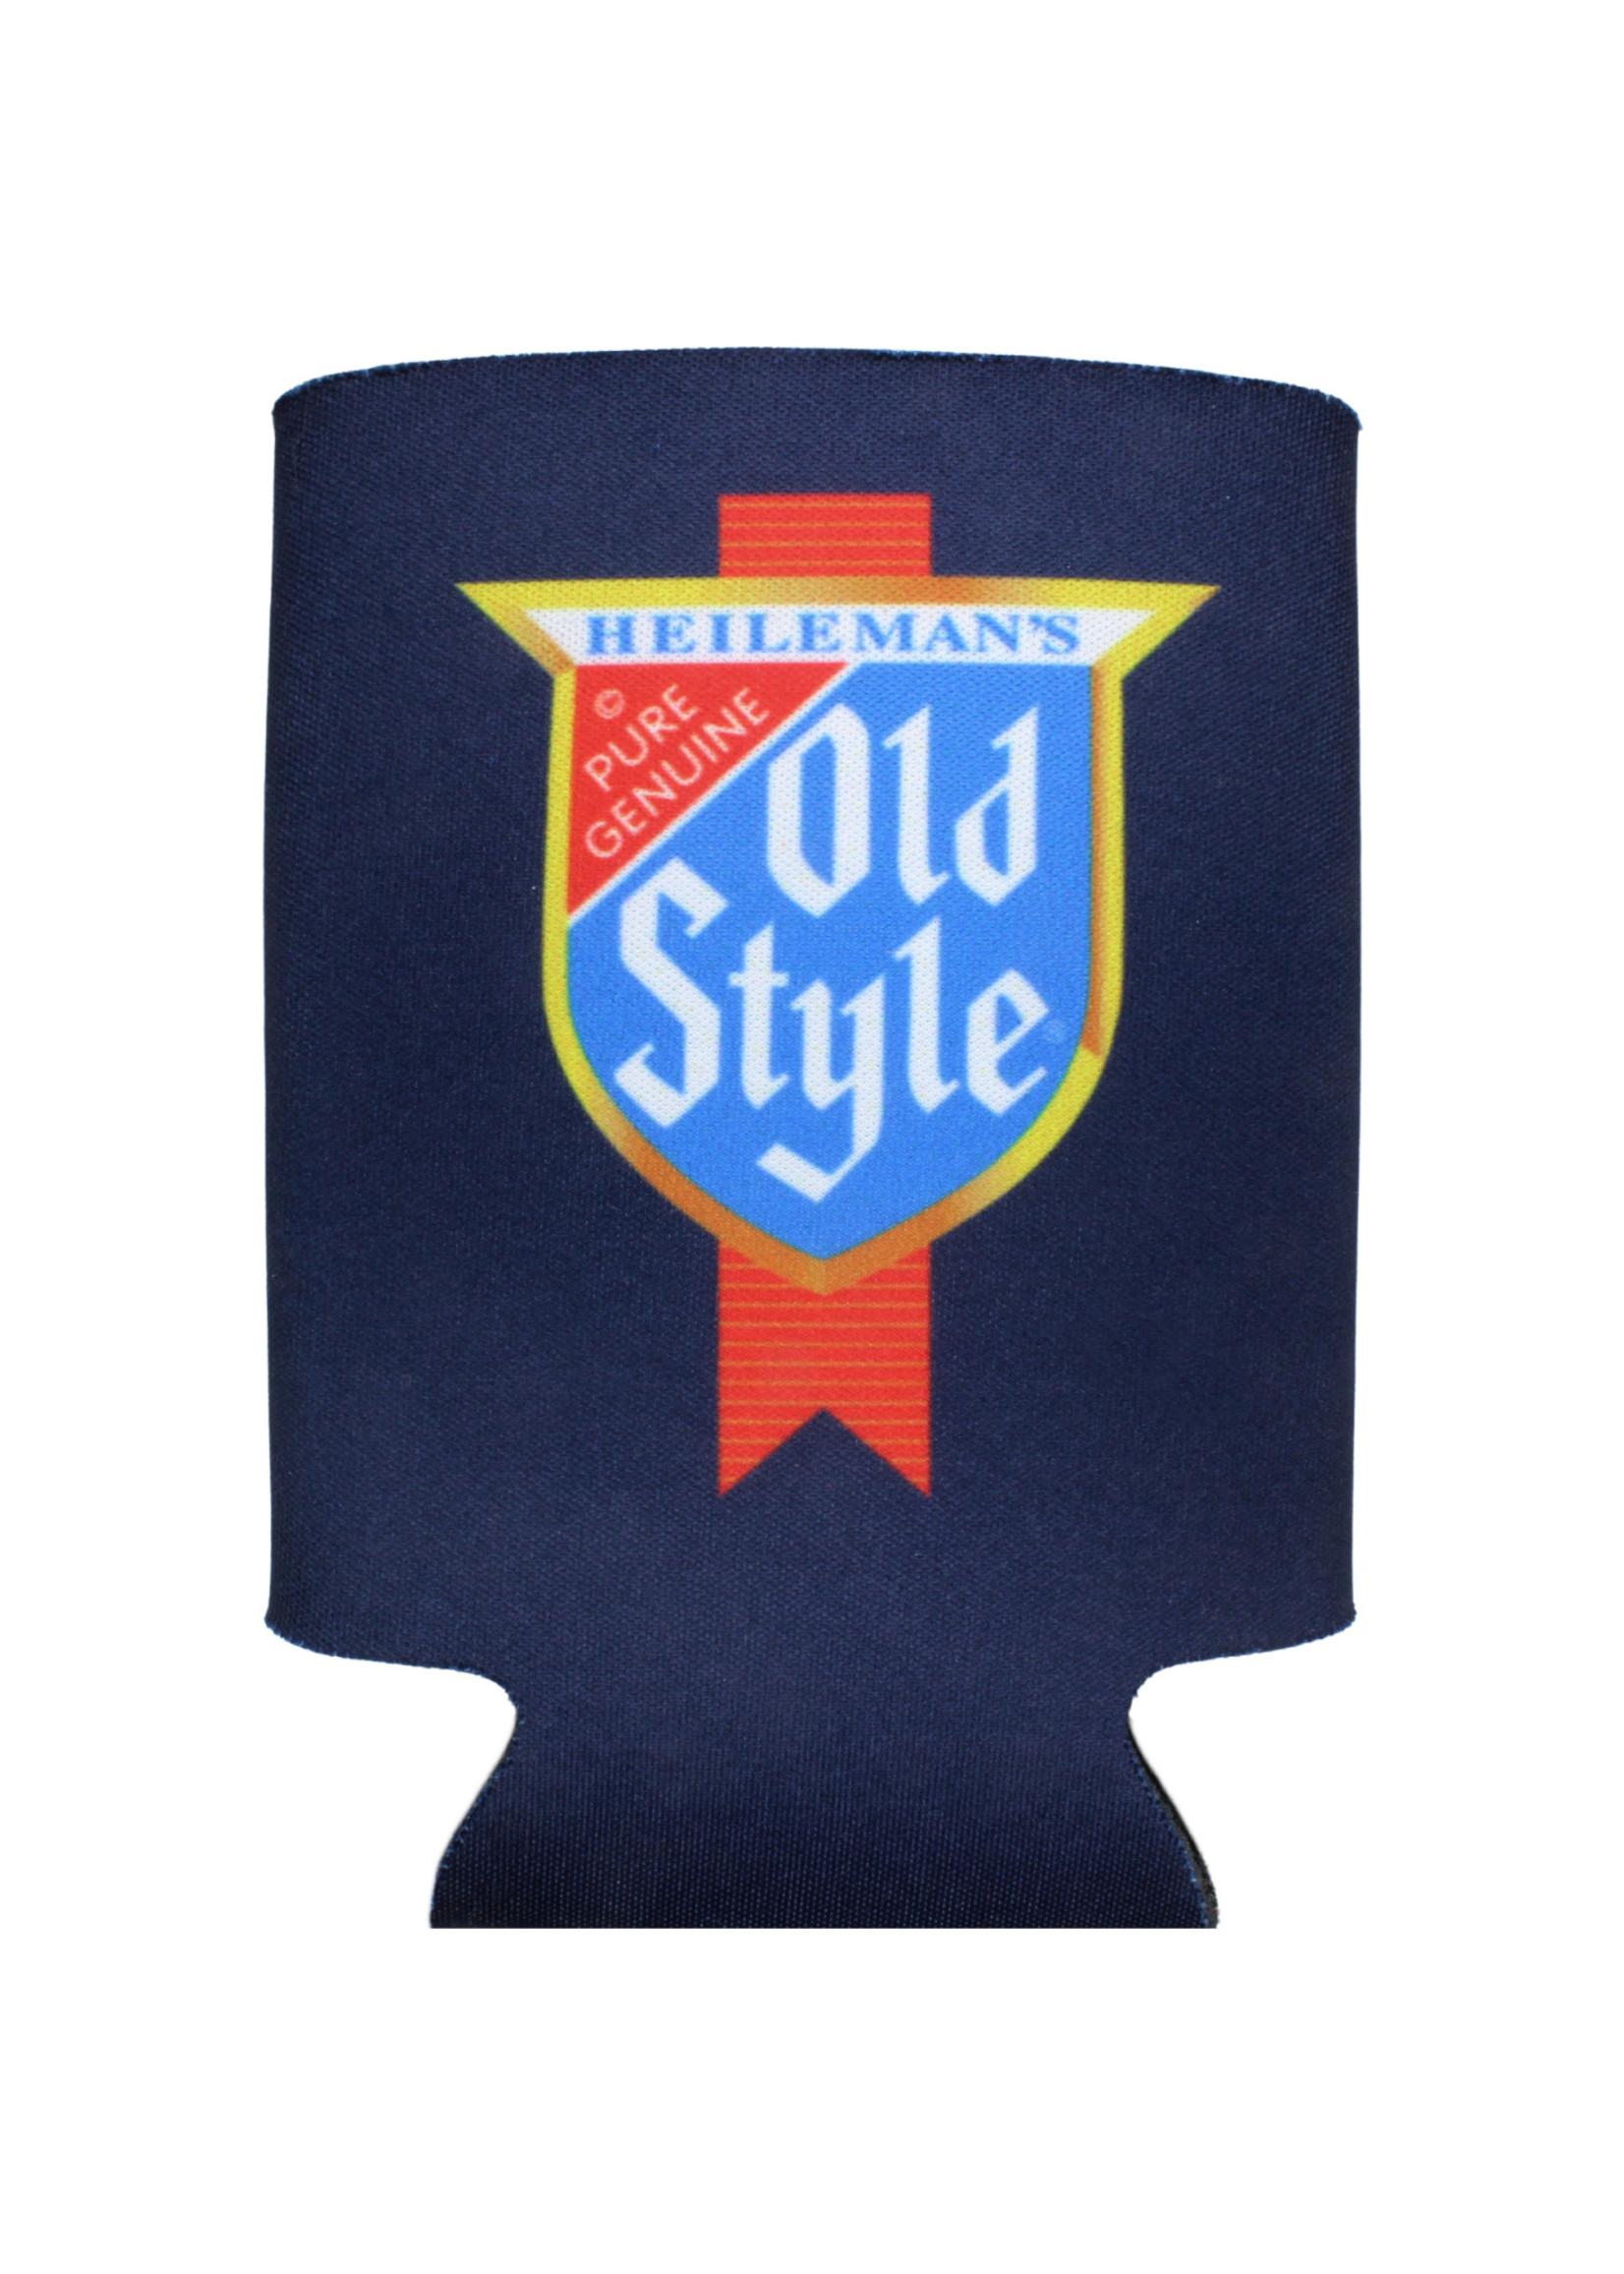 Old Style Old Style 12oz Koozie